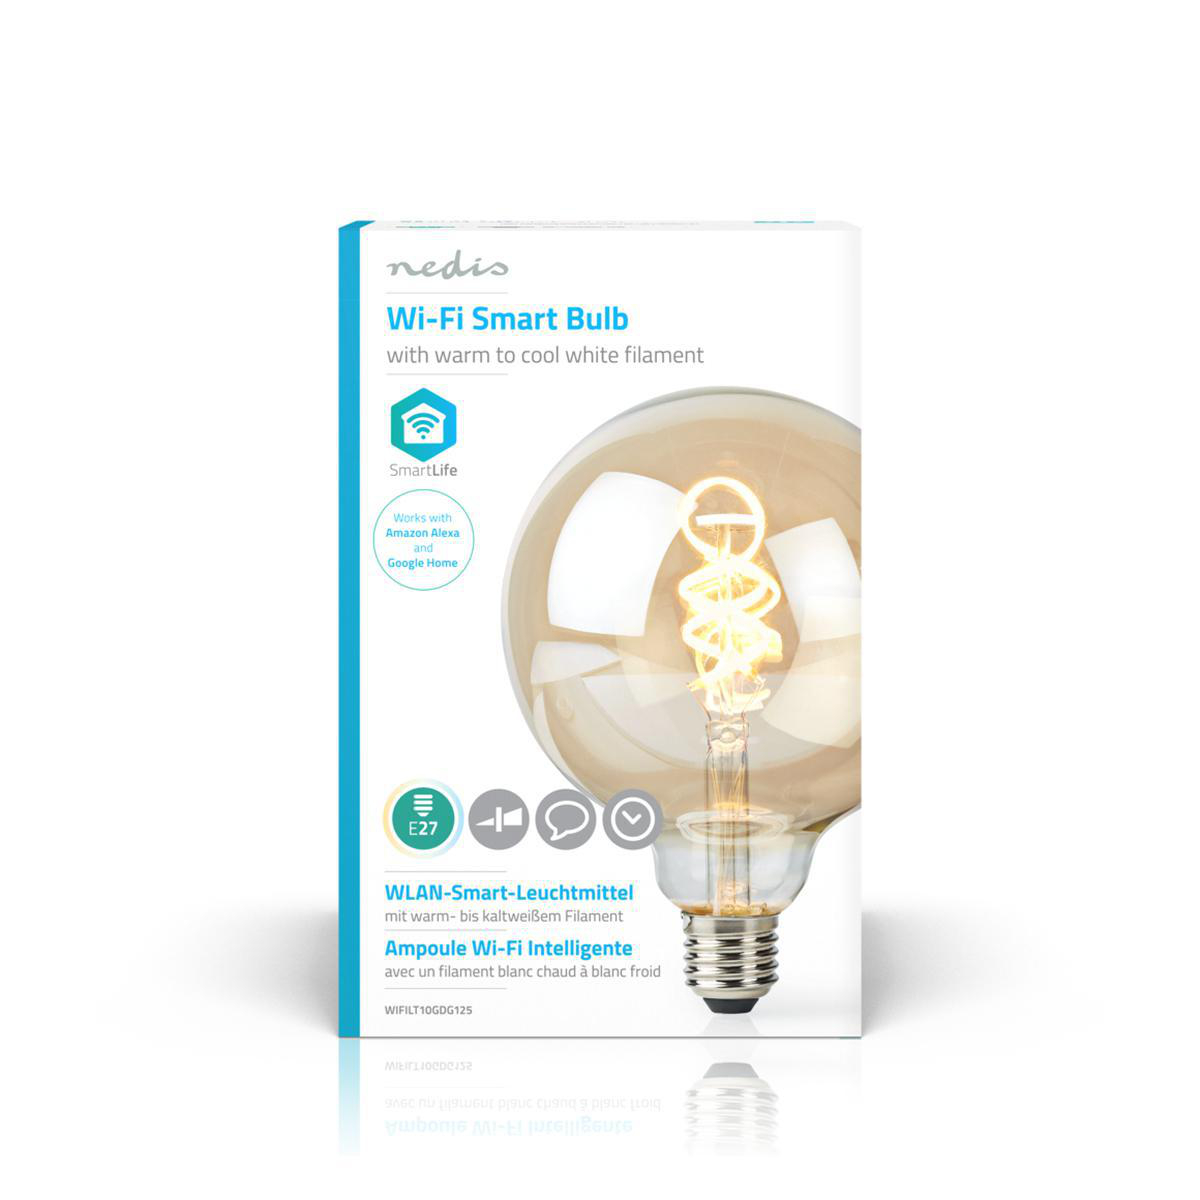 Globe spiraal lamp G125 - 125mm - LED slimme lamp - Amber - dimbaar - app besturing - filament - voorkant doos